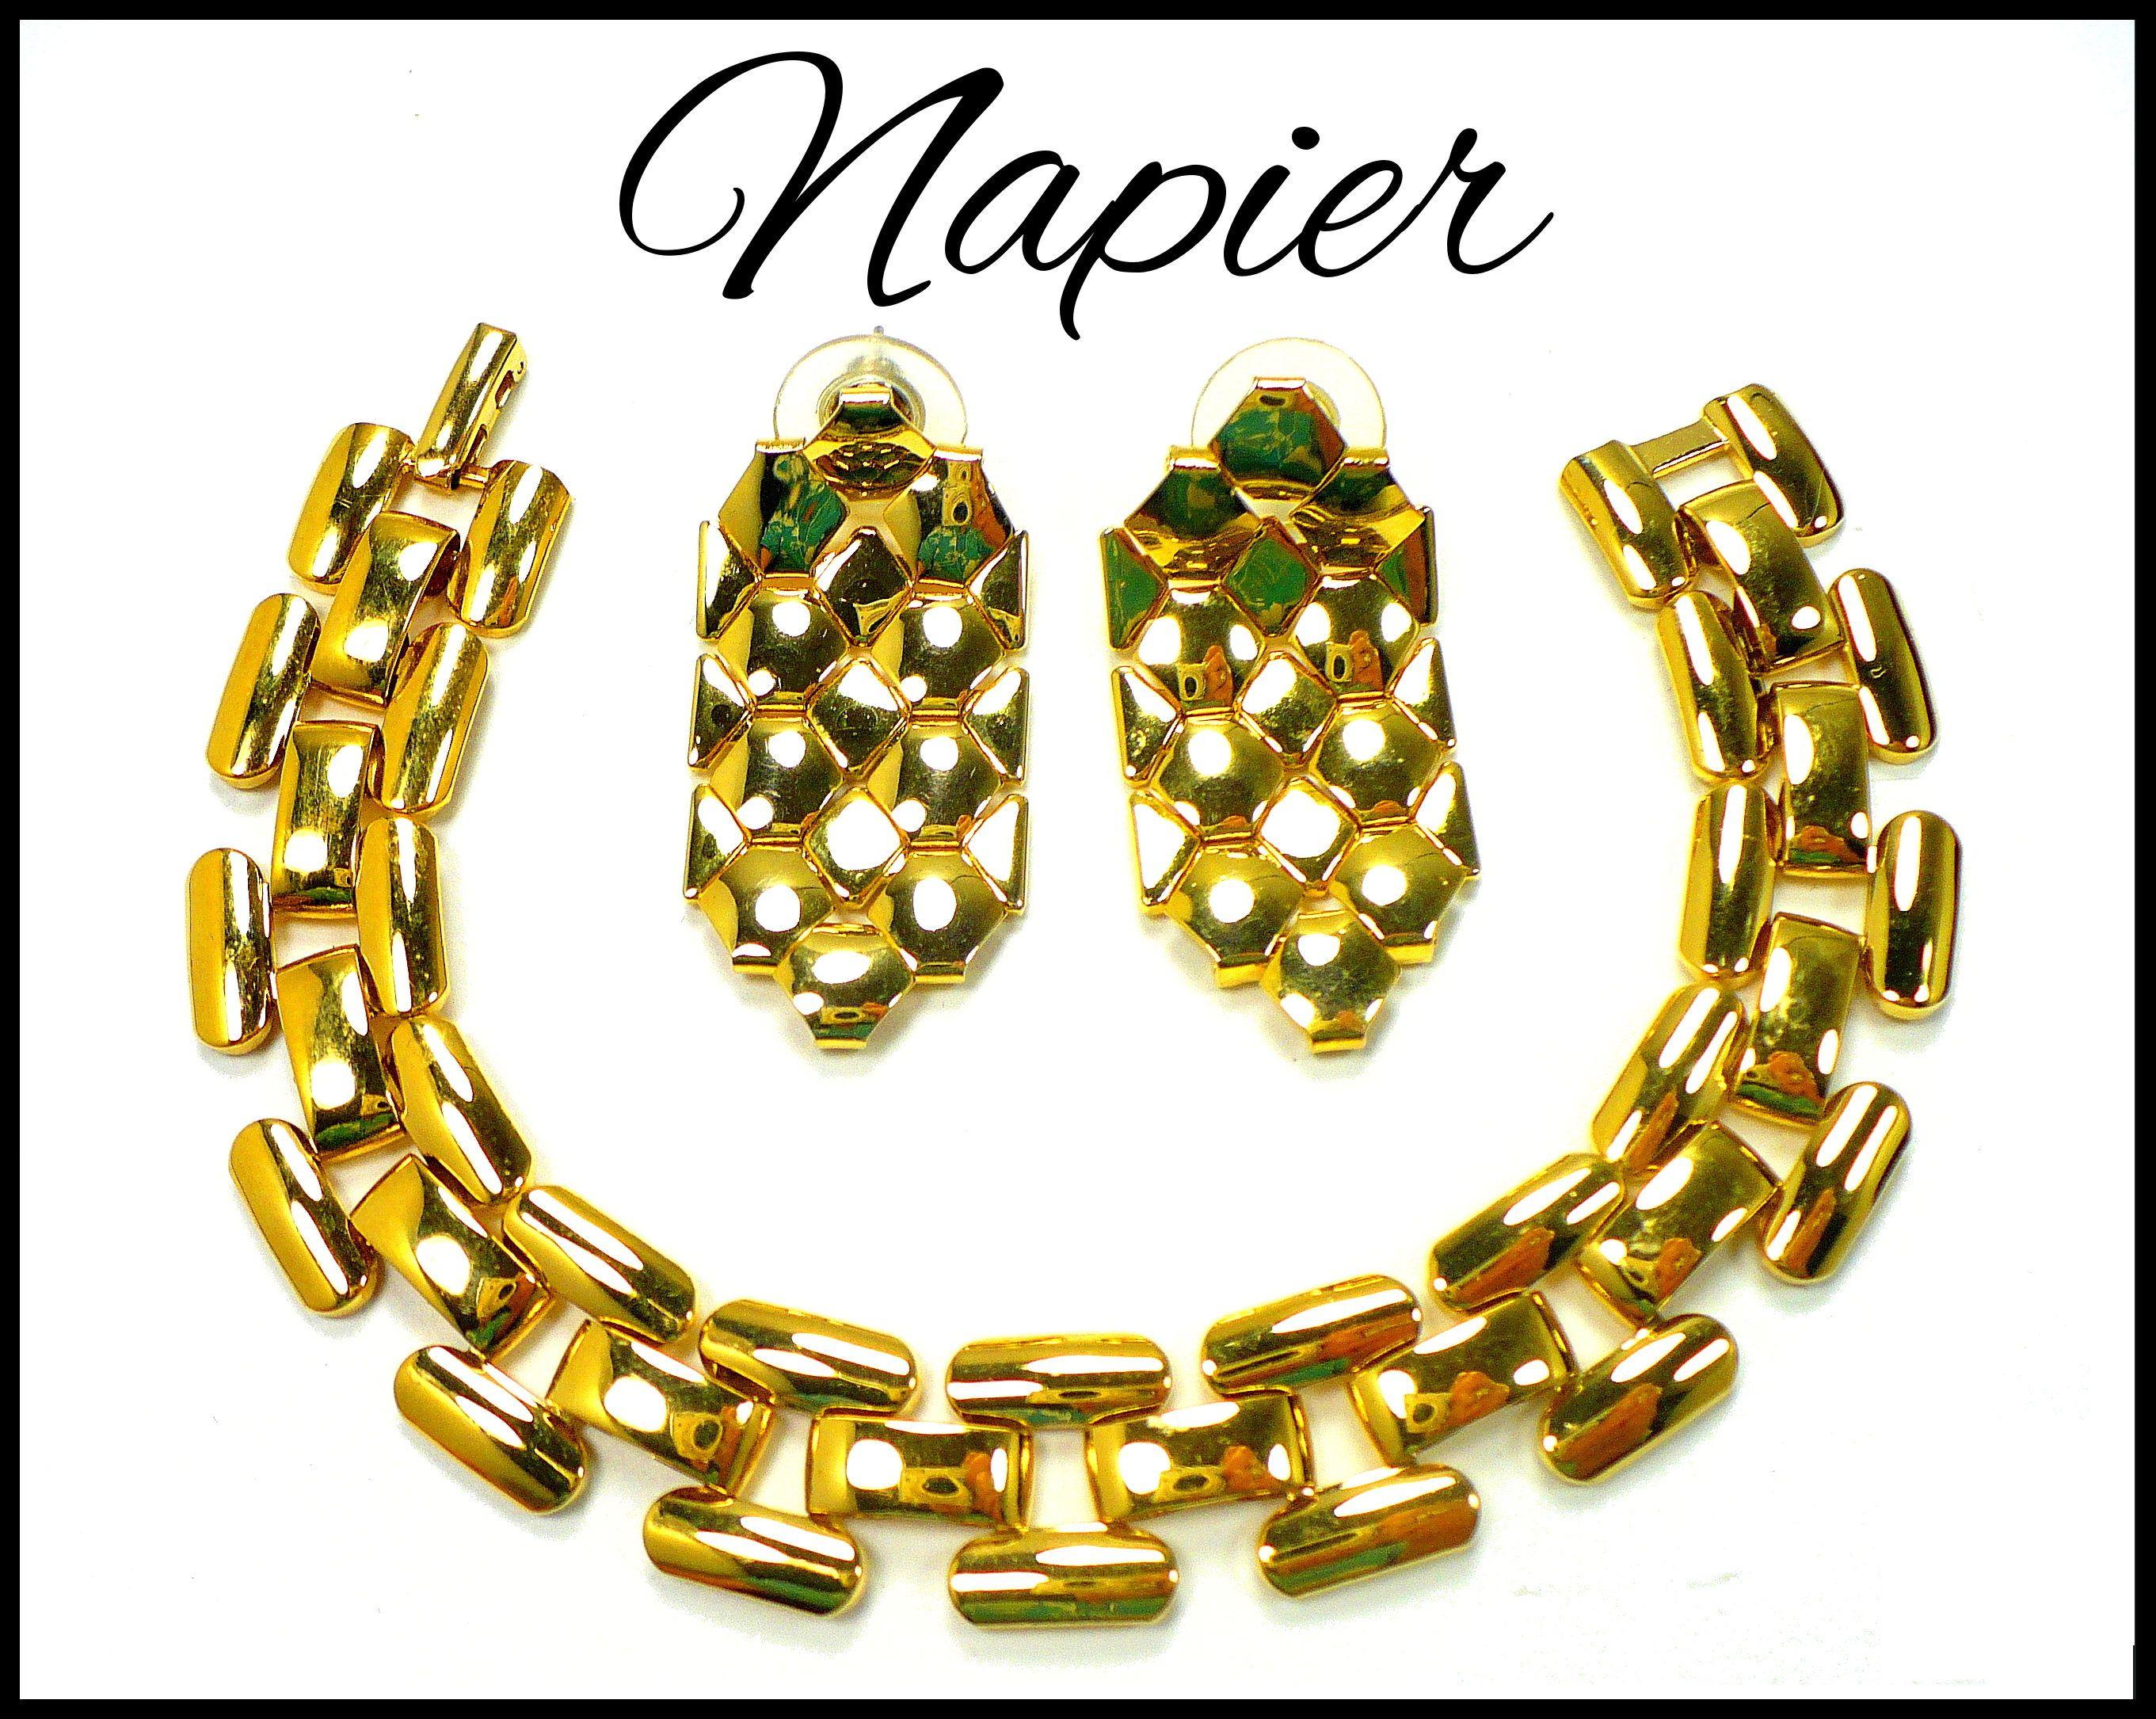 Napier gold bracelet u earrings set patent pending wide chain